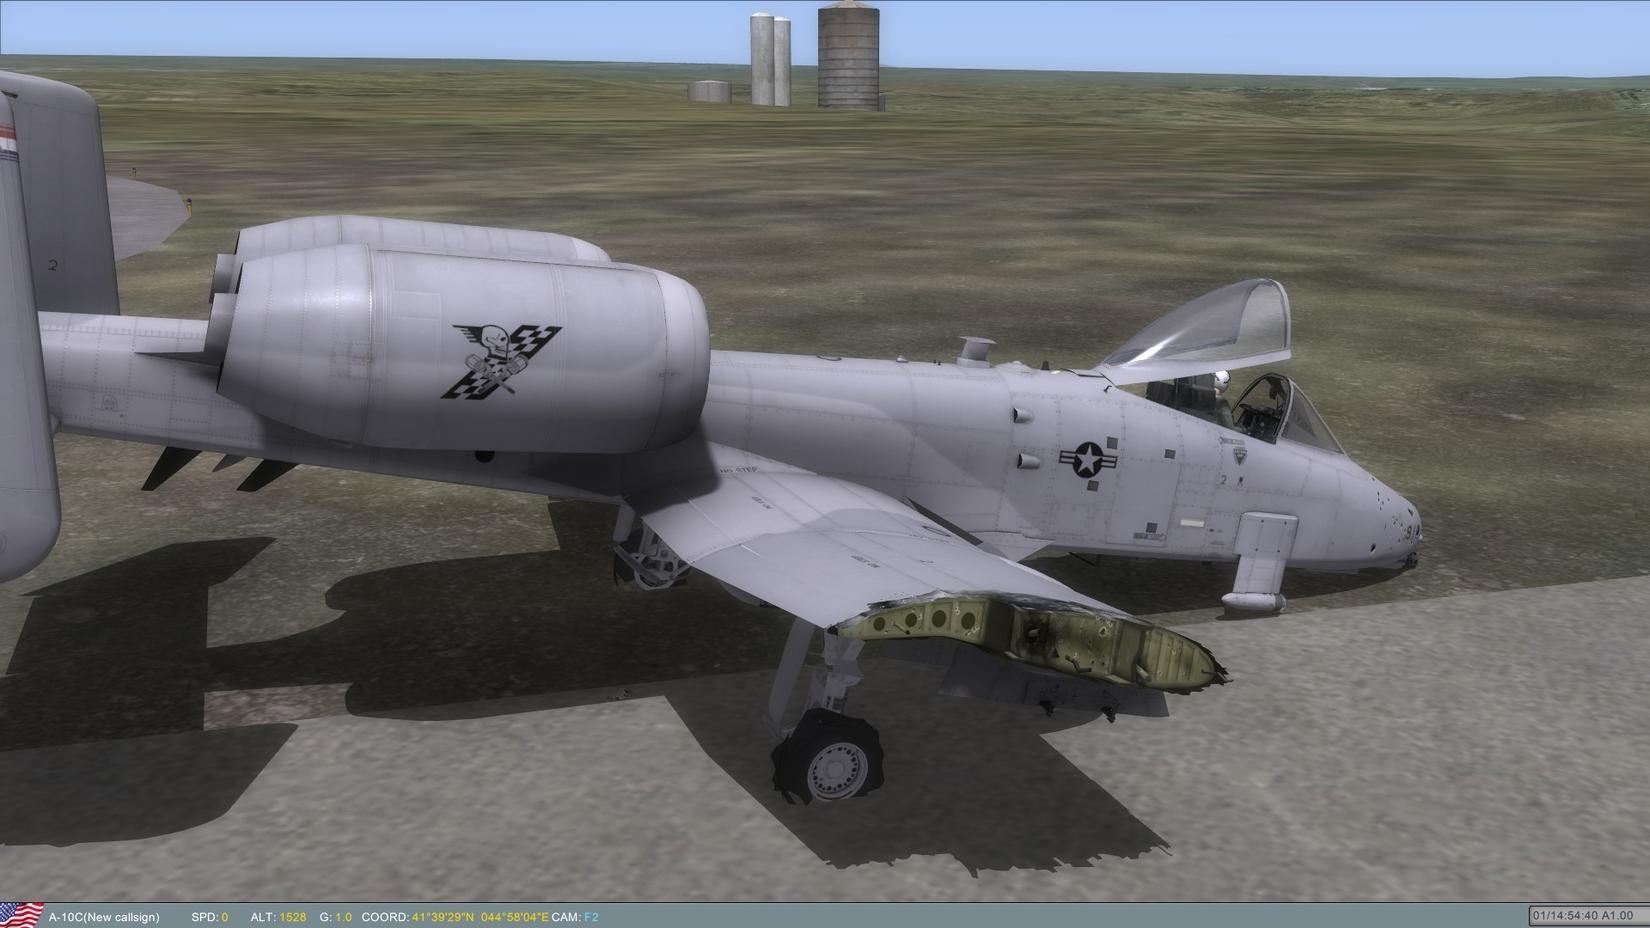 《dcs:a-10c疣猪》图片/视频集